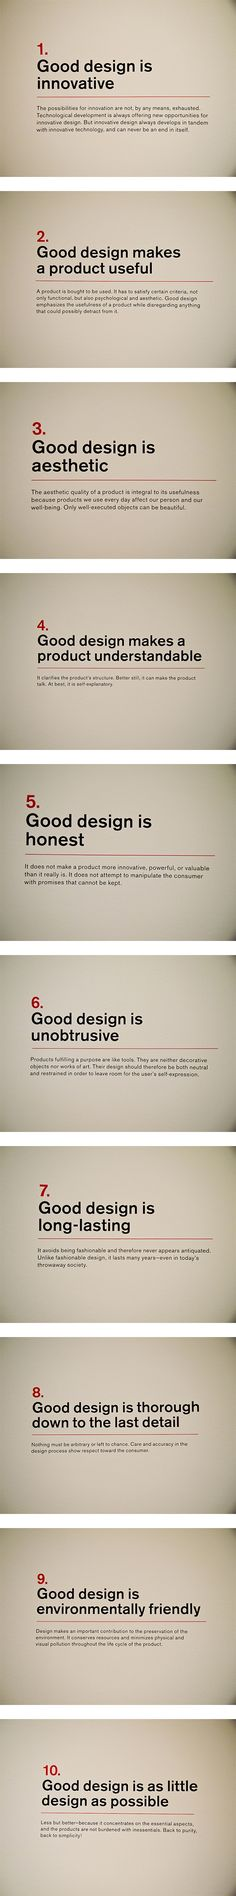 [10 Commandments of Good Design] What do you think?  www.geneciaalluora.com